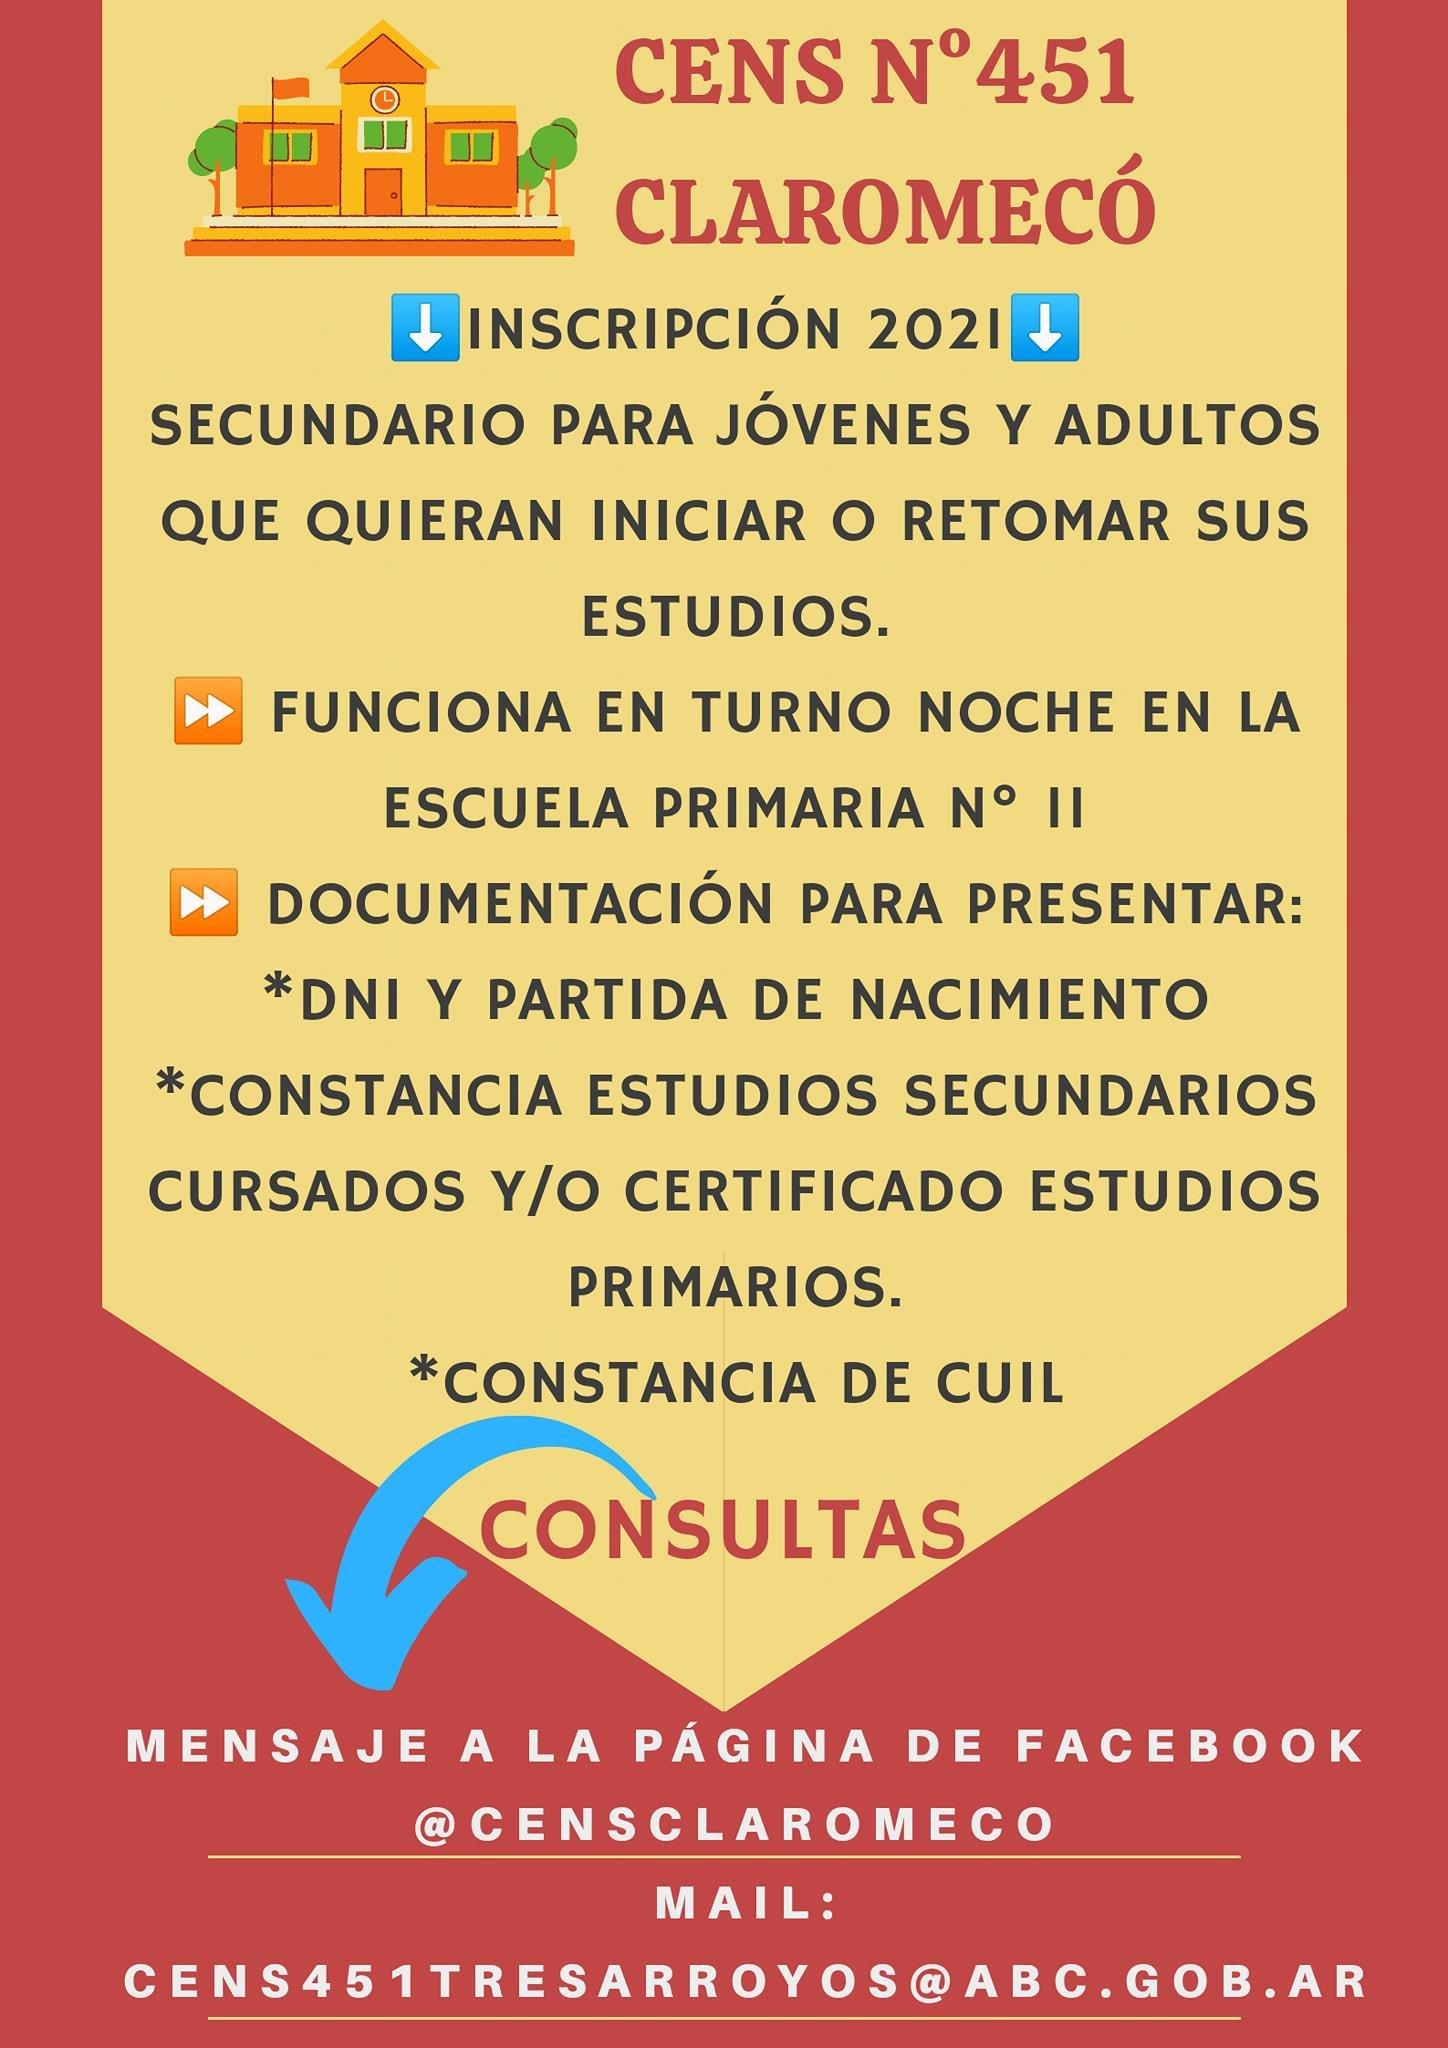 Abren inscripción para terminar el Secundario en Claromecó